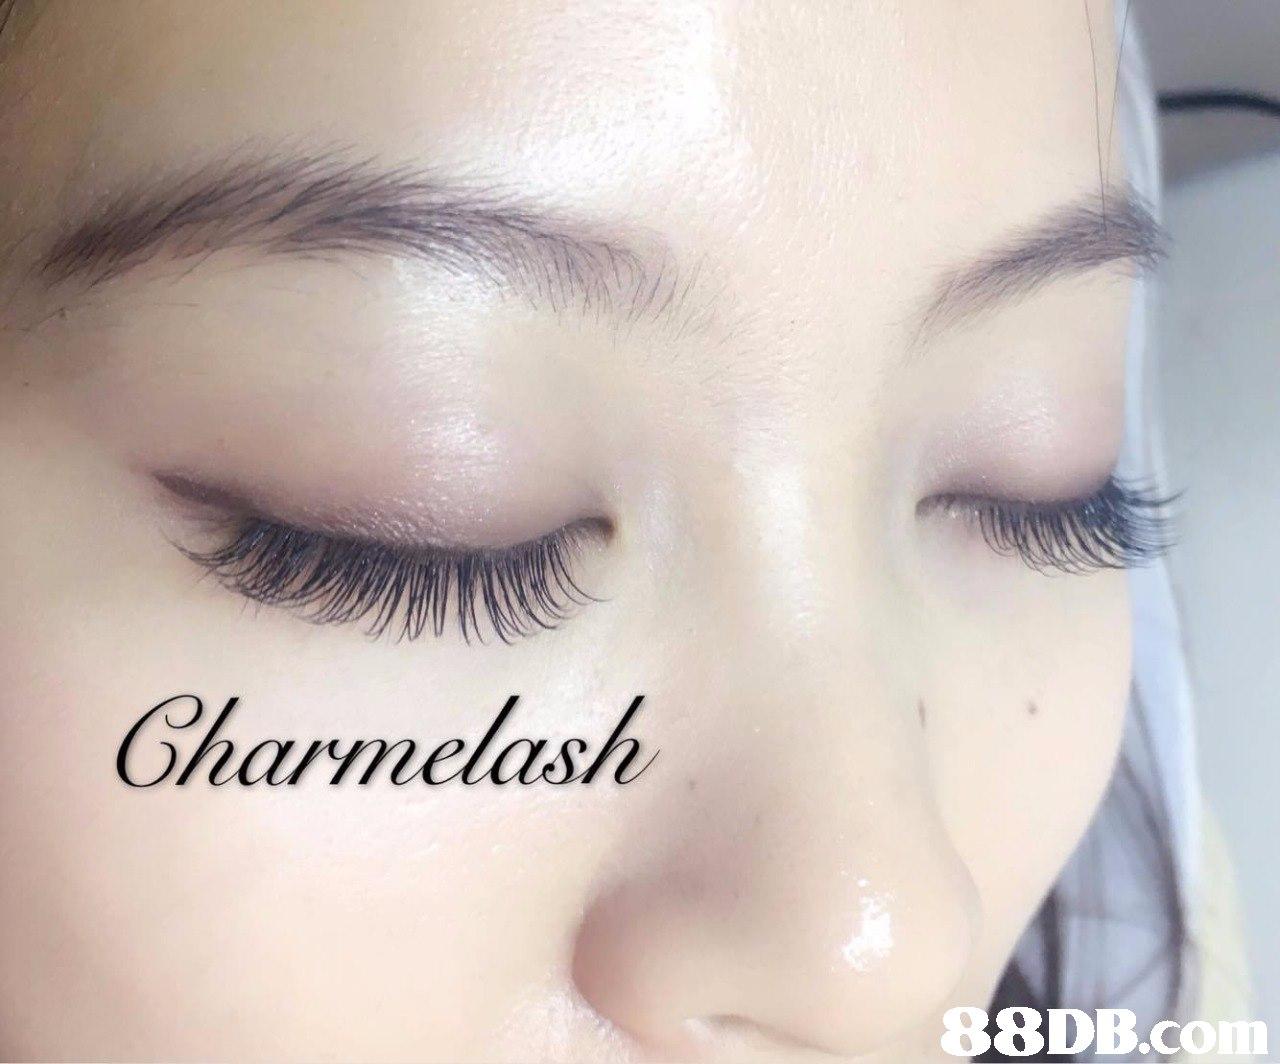 Gharmelash 8DB.com  eyebrow,eyelash,beauty,nose,eye